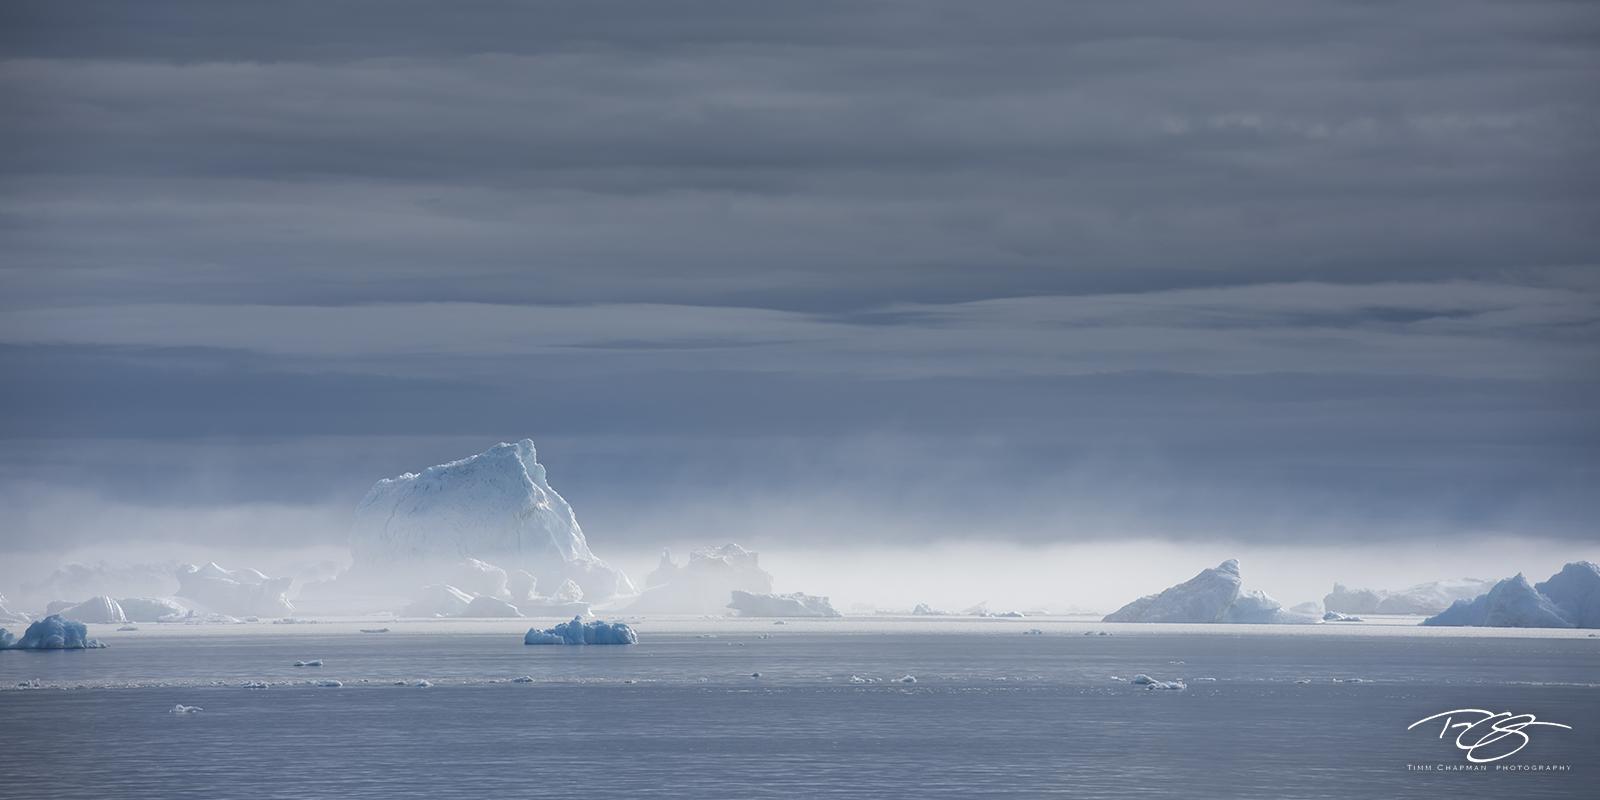 ice; iceberg; fog; foggy; mist; dreamy; disko bay, photo